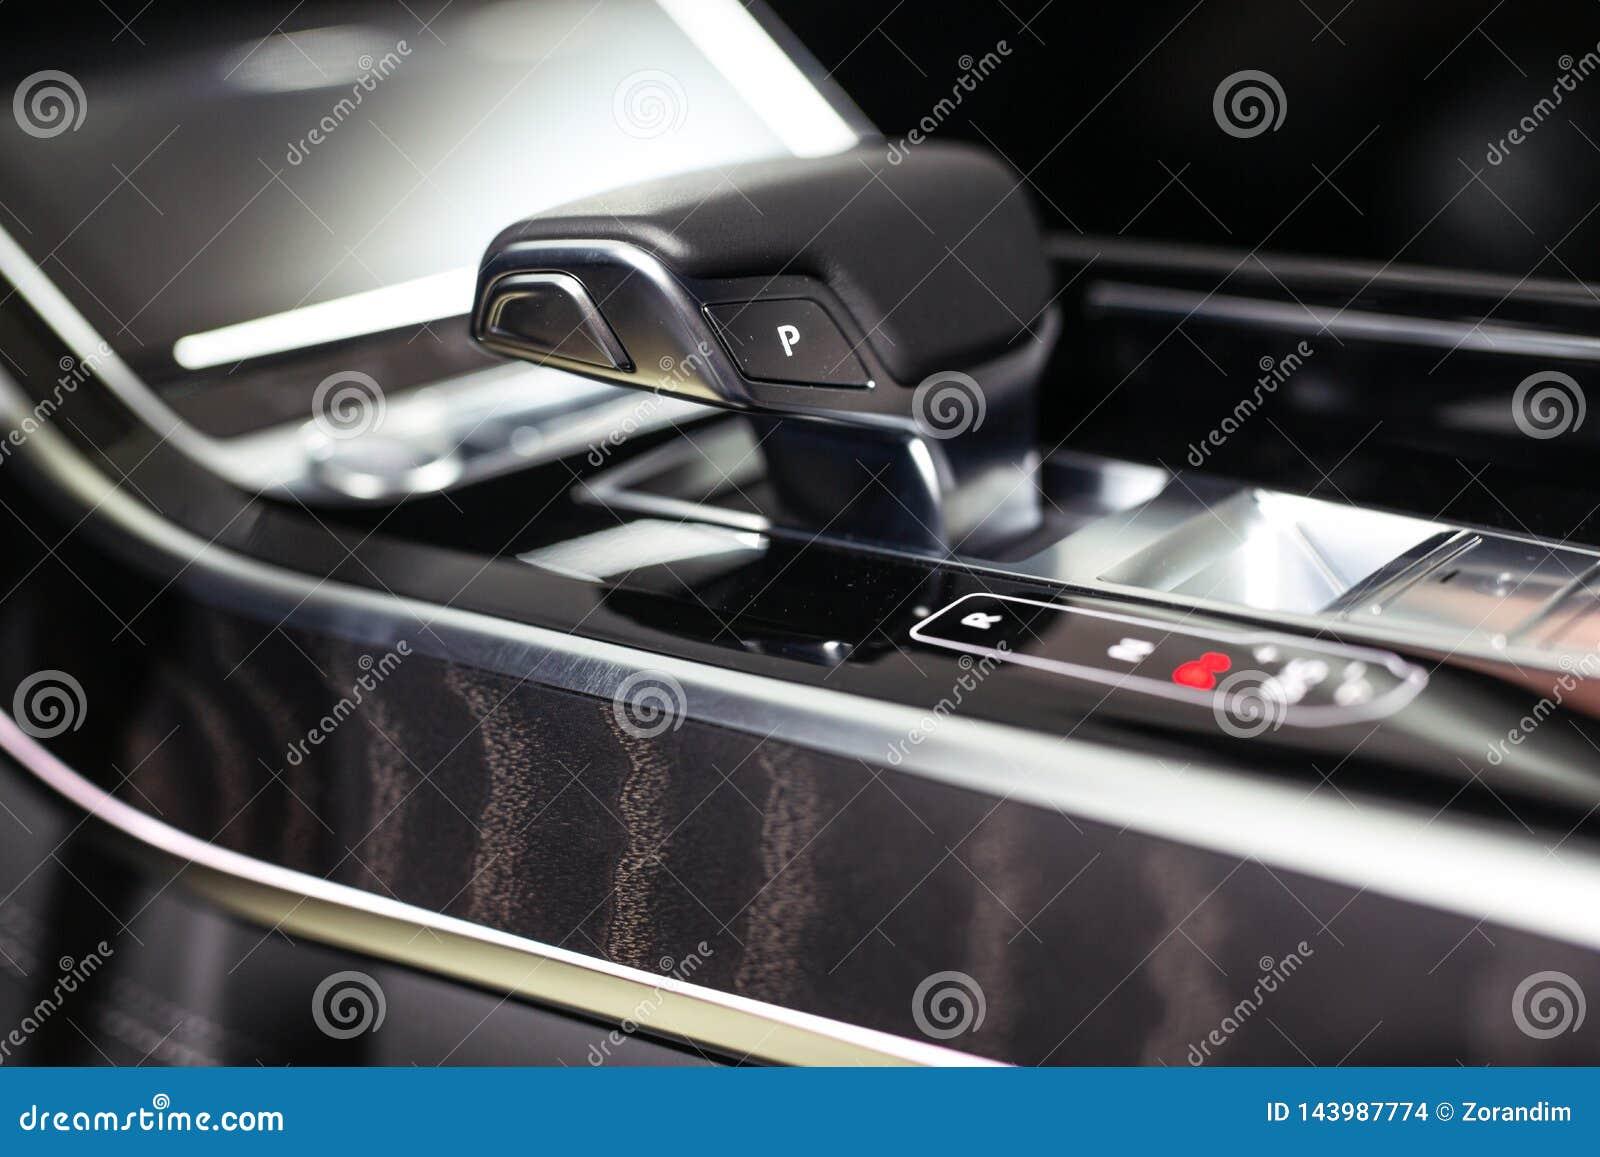 Modern shift gear in luxury car interior